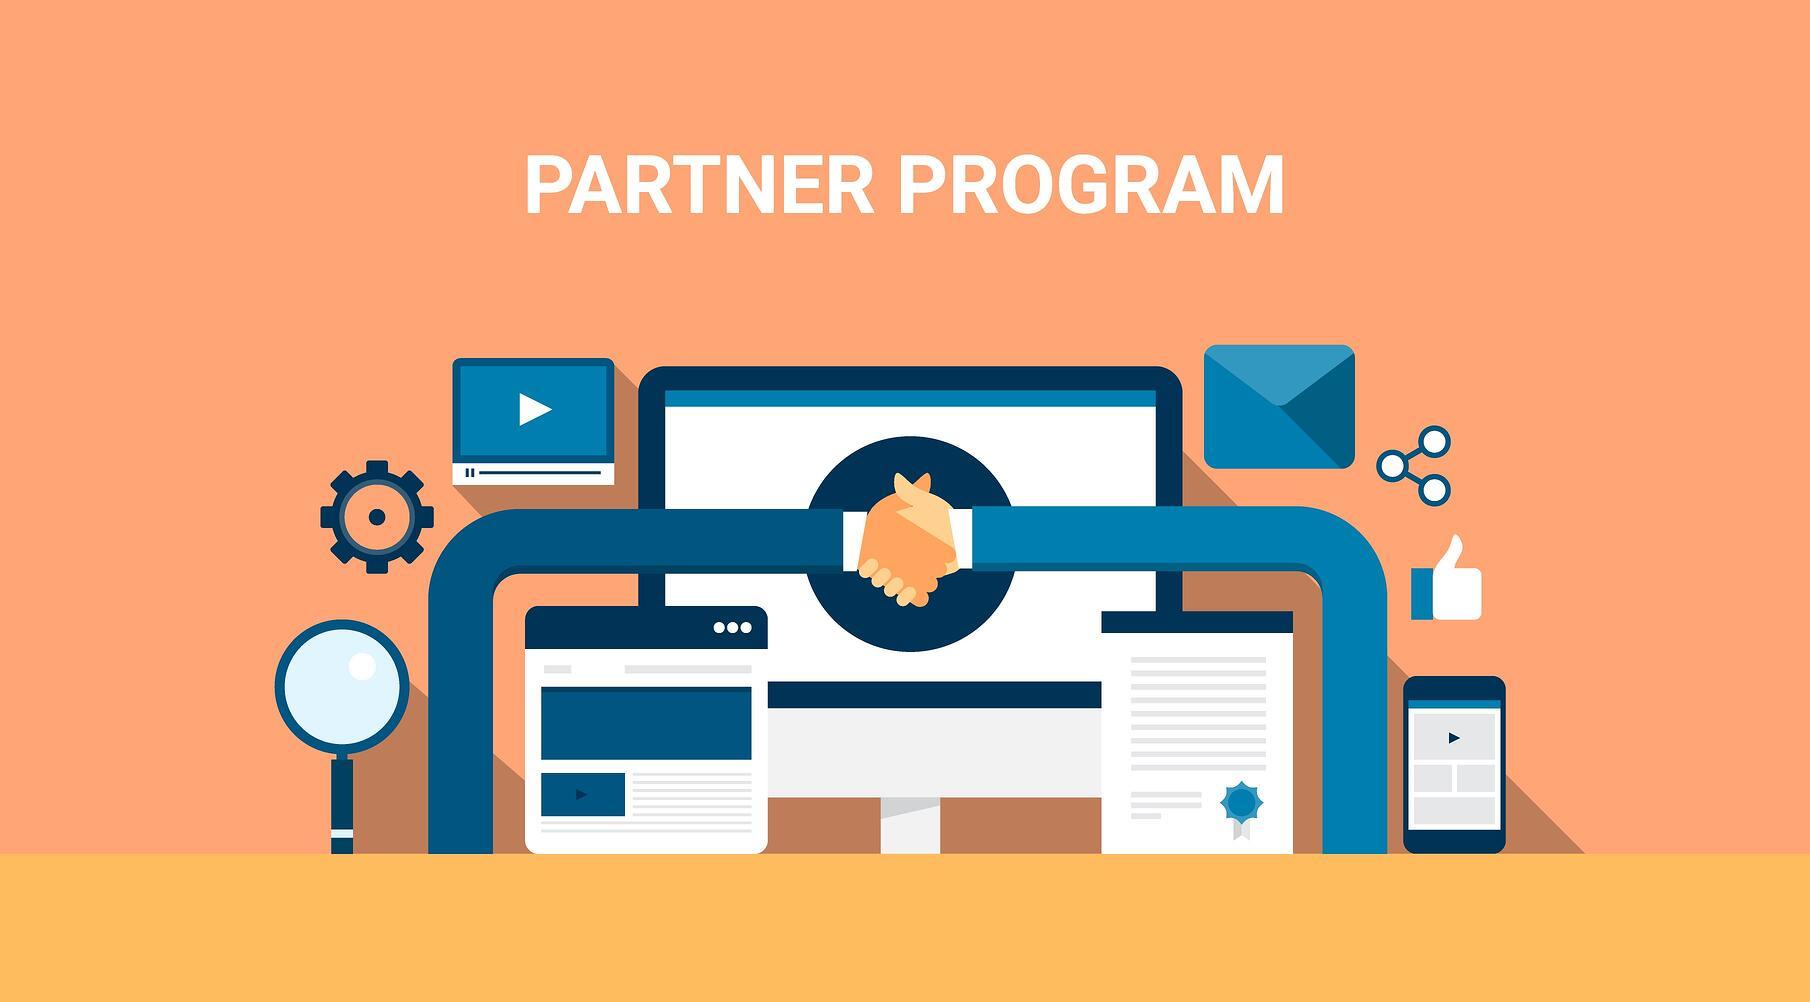 Partnership program - FBS - FAQ